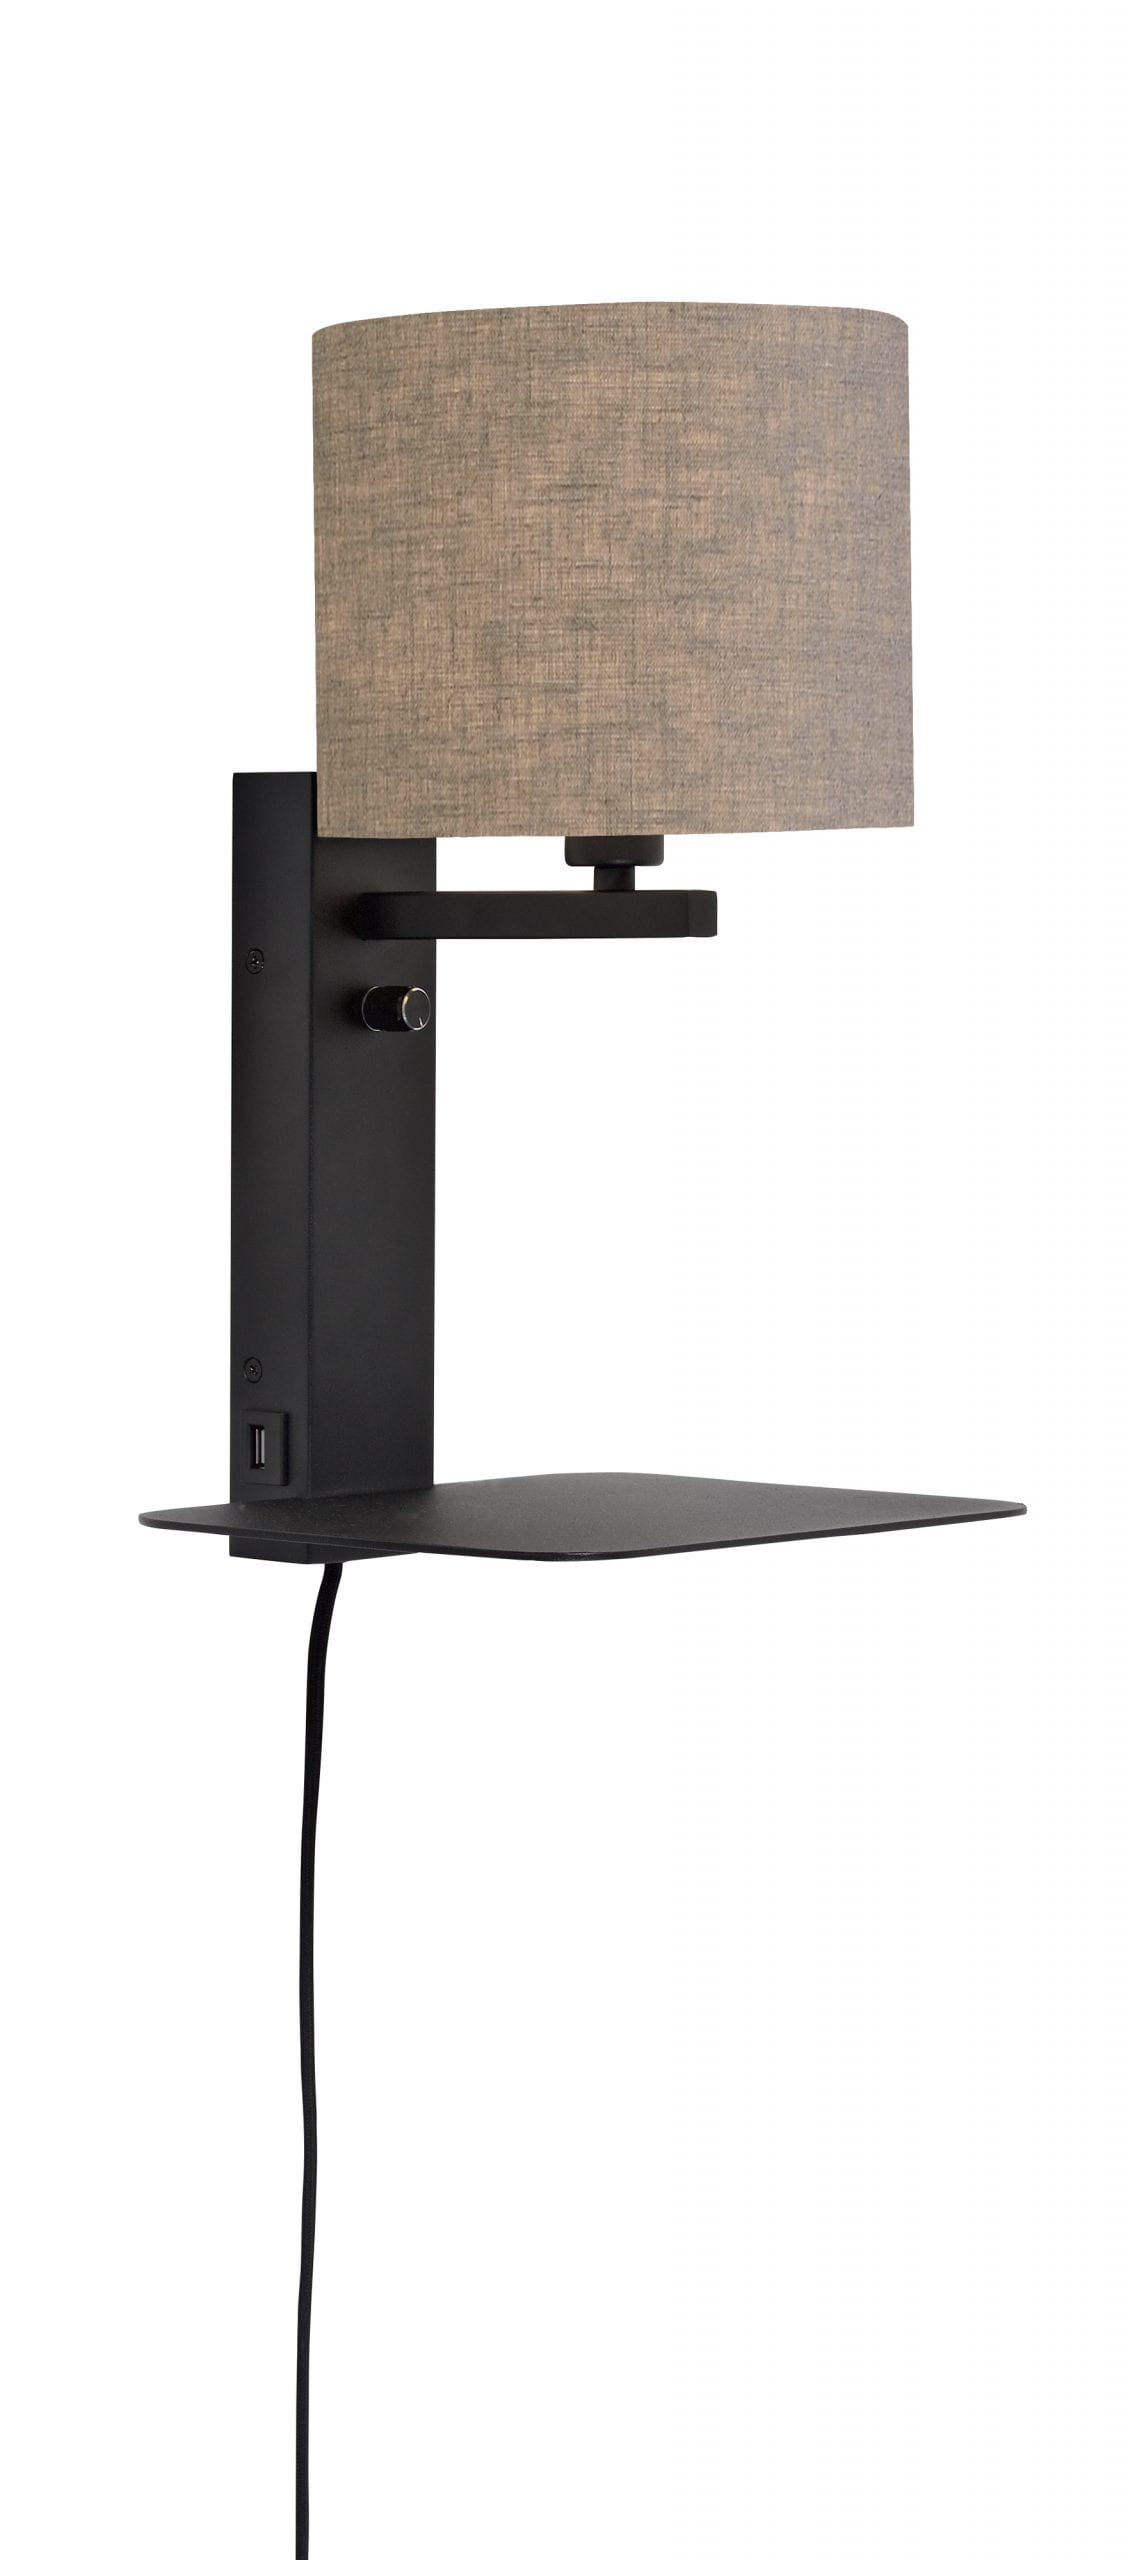 Wandlamp Florence - Black/Linen dark - 47cm